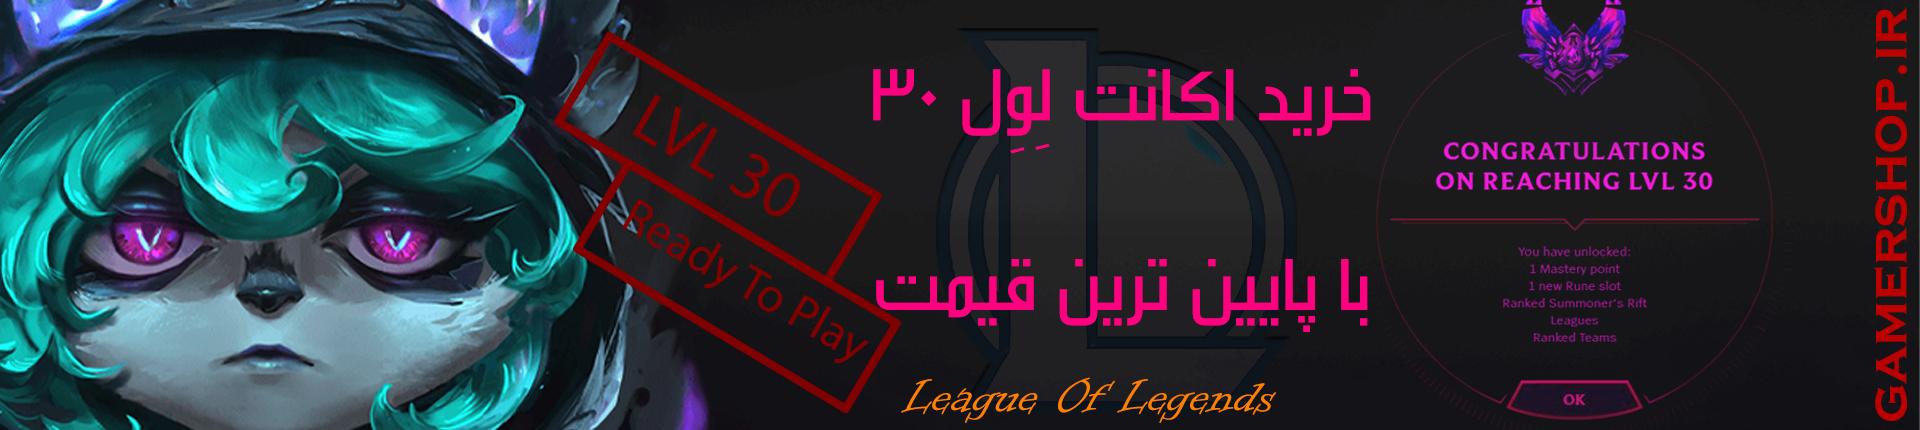 lvl30 top site